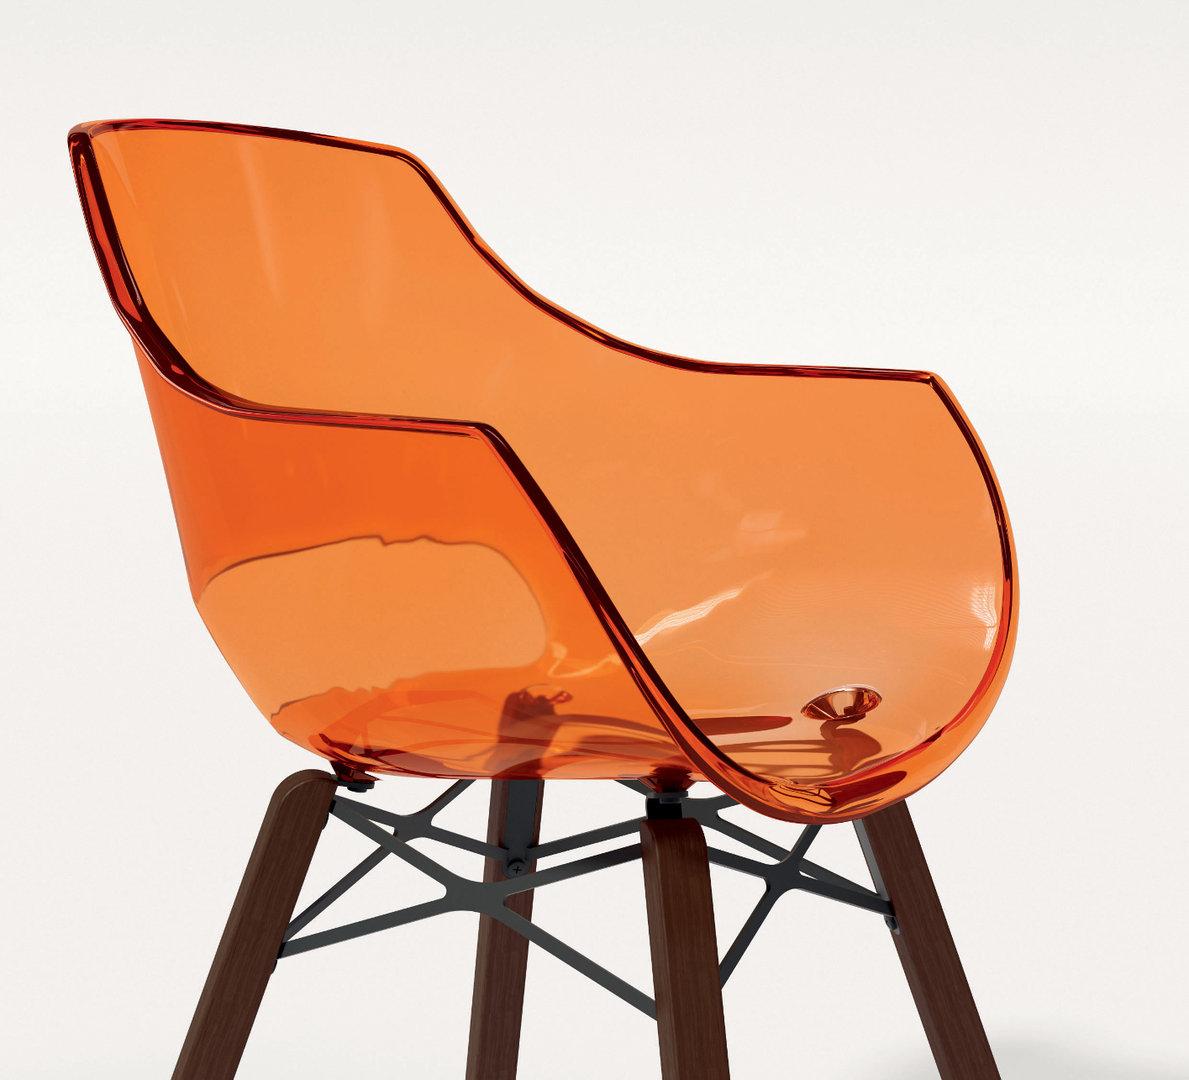 Stuhl schule clipart  Stuhl Opal Wox Iroko von Papatya | buerado.de